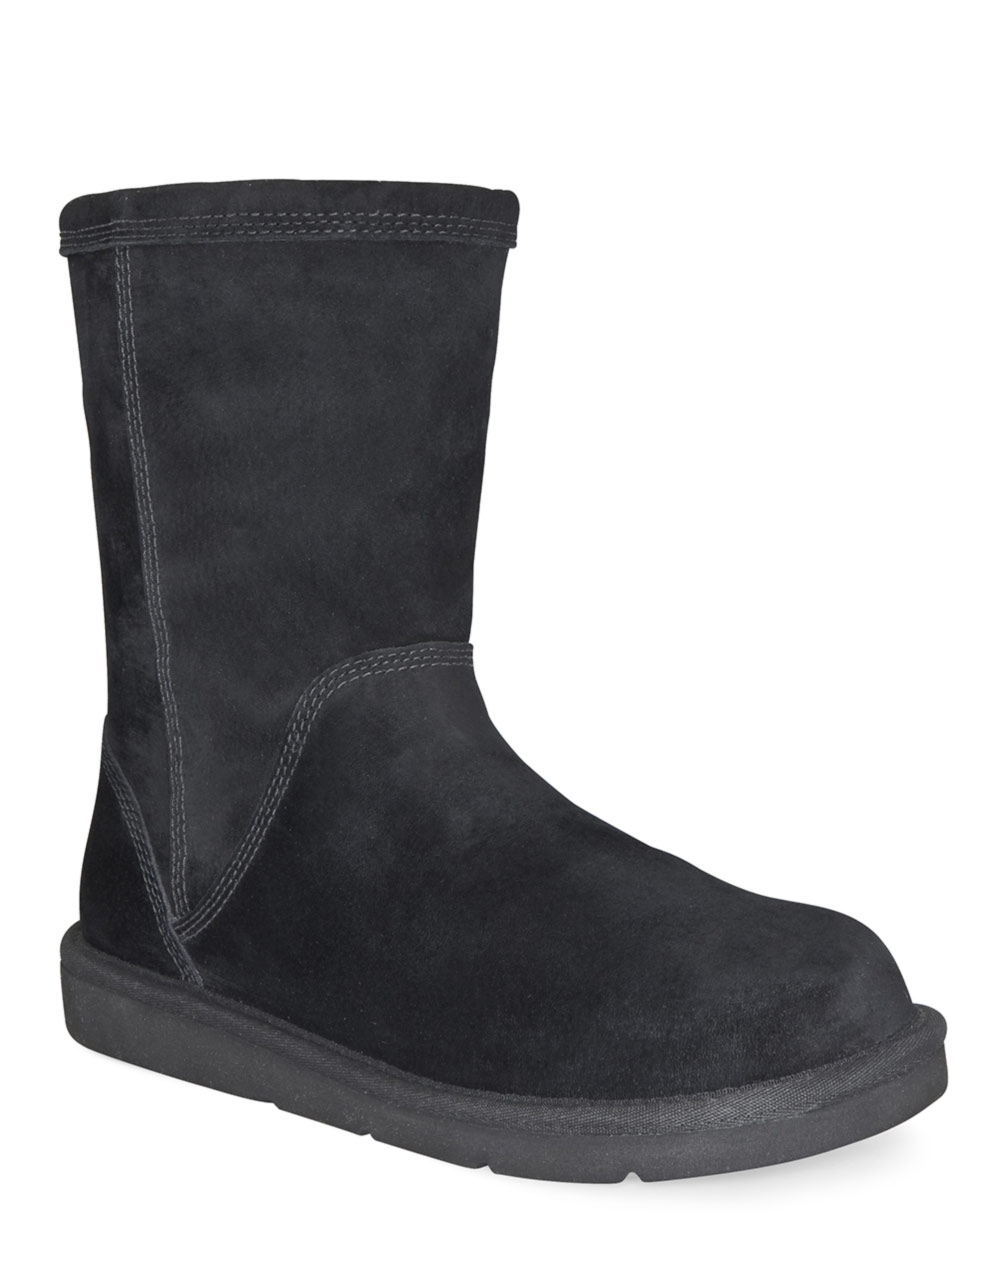 ugg roslynn boot review